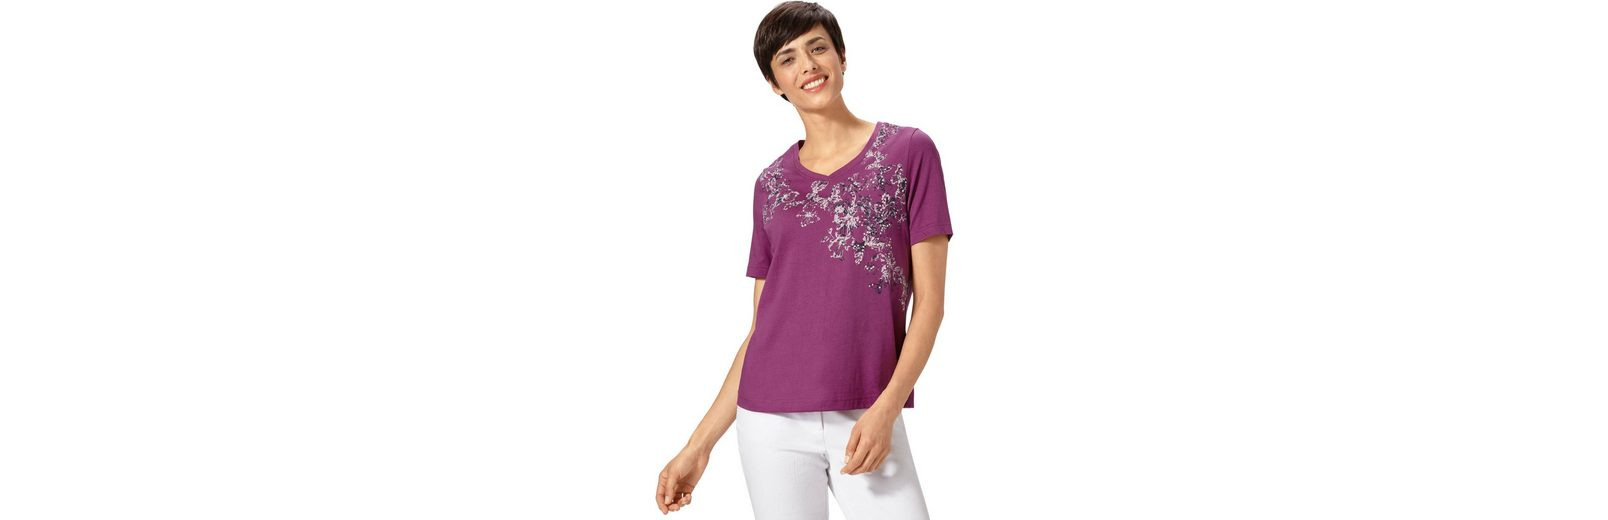 Classic Basics Shirt mit Bl眉tenmuster